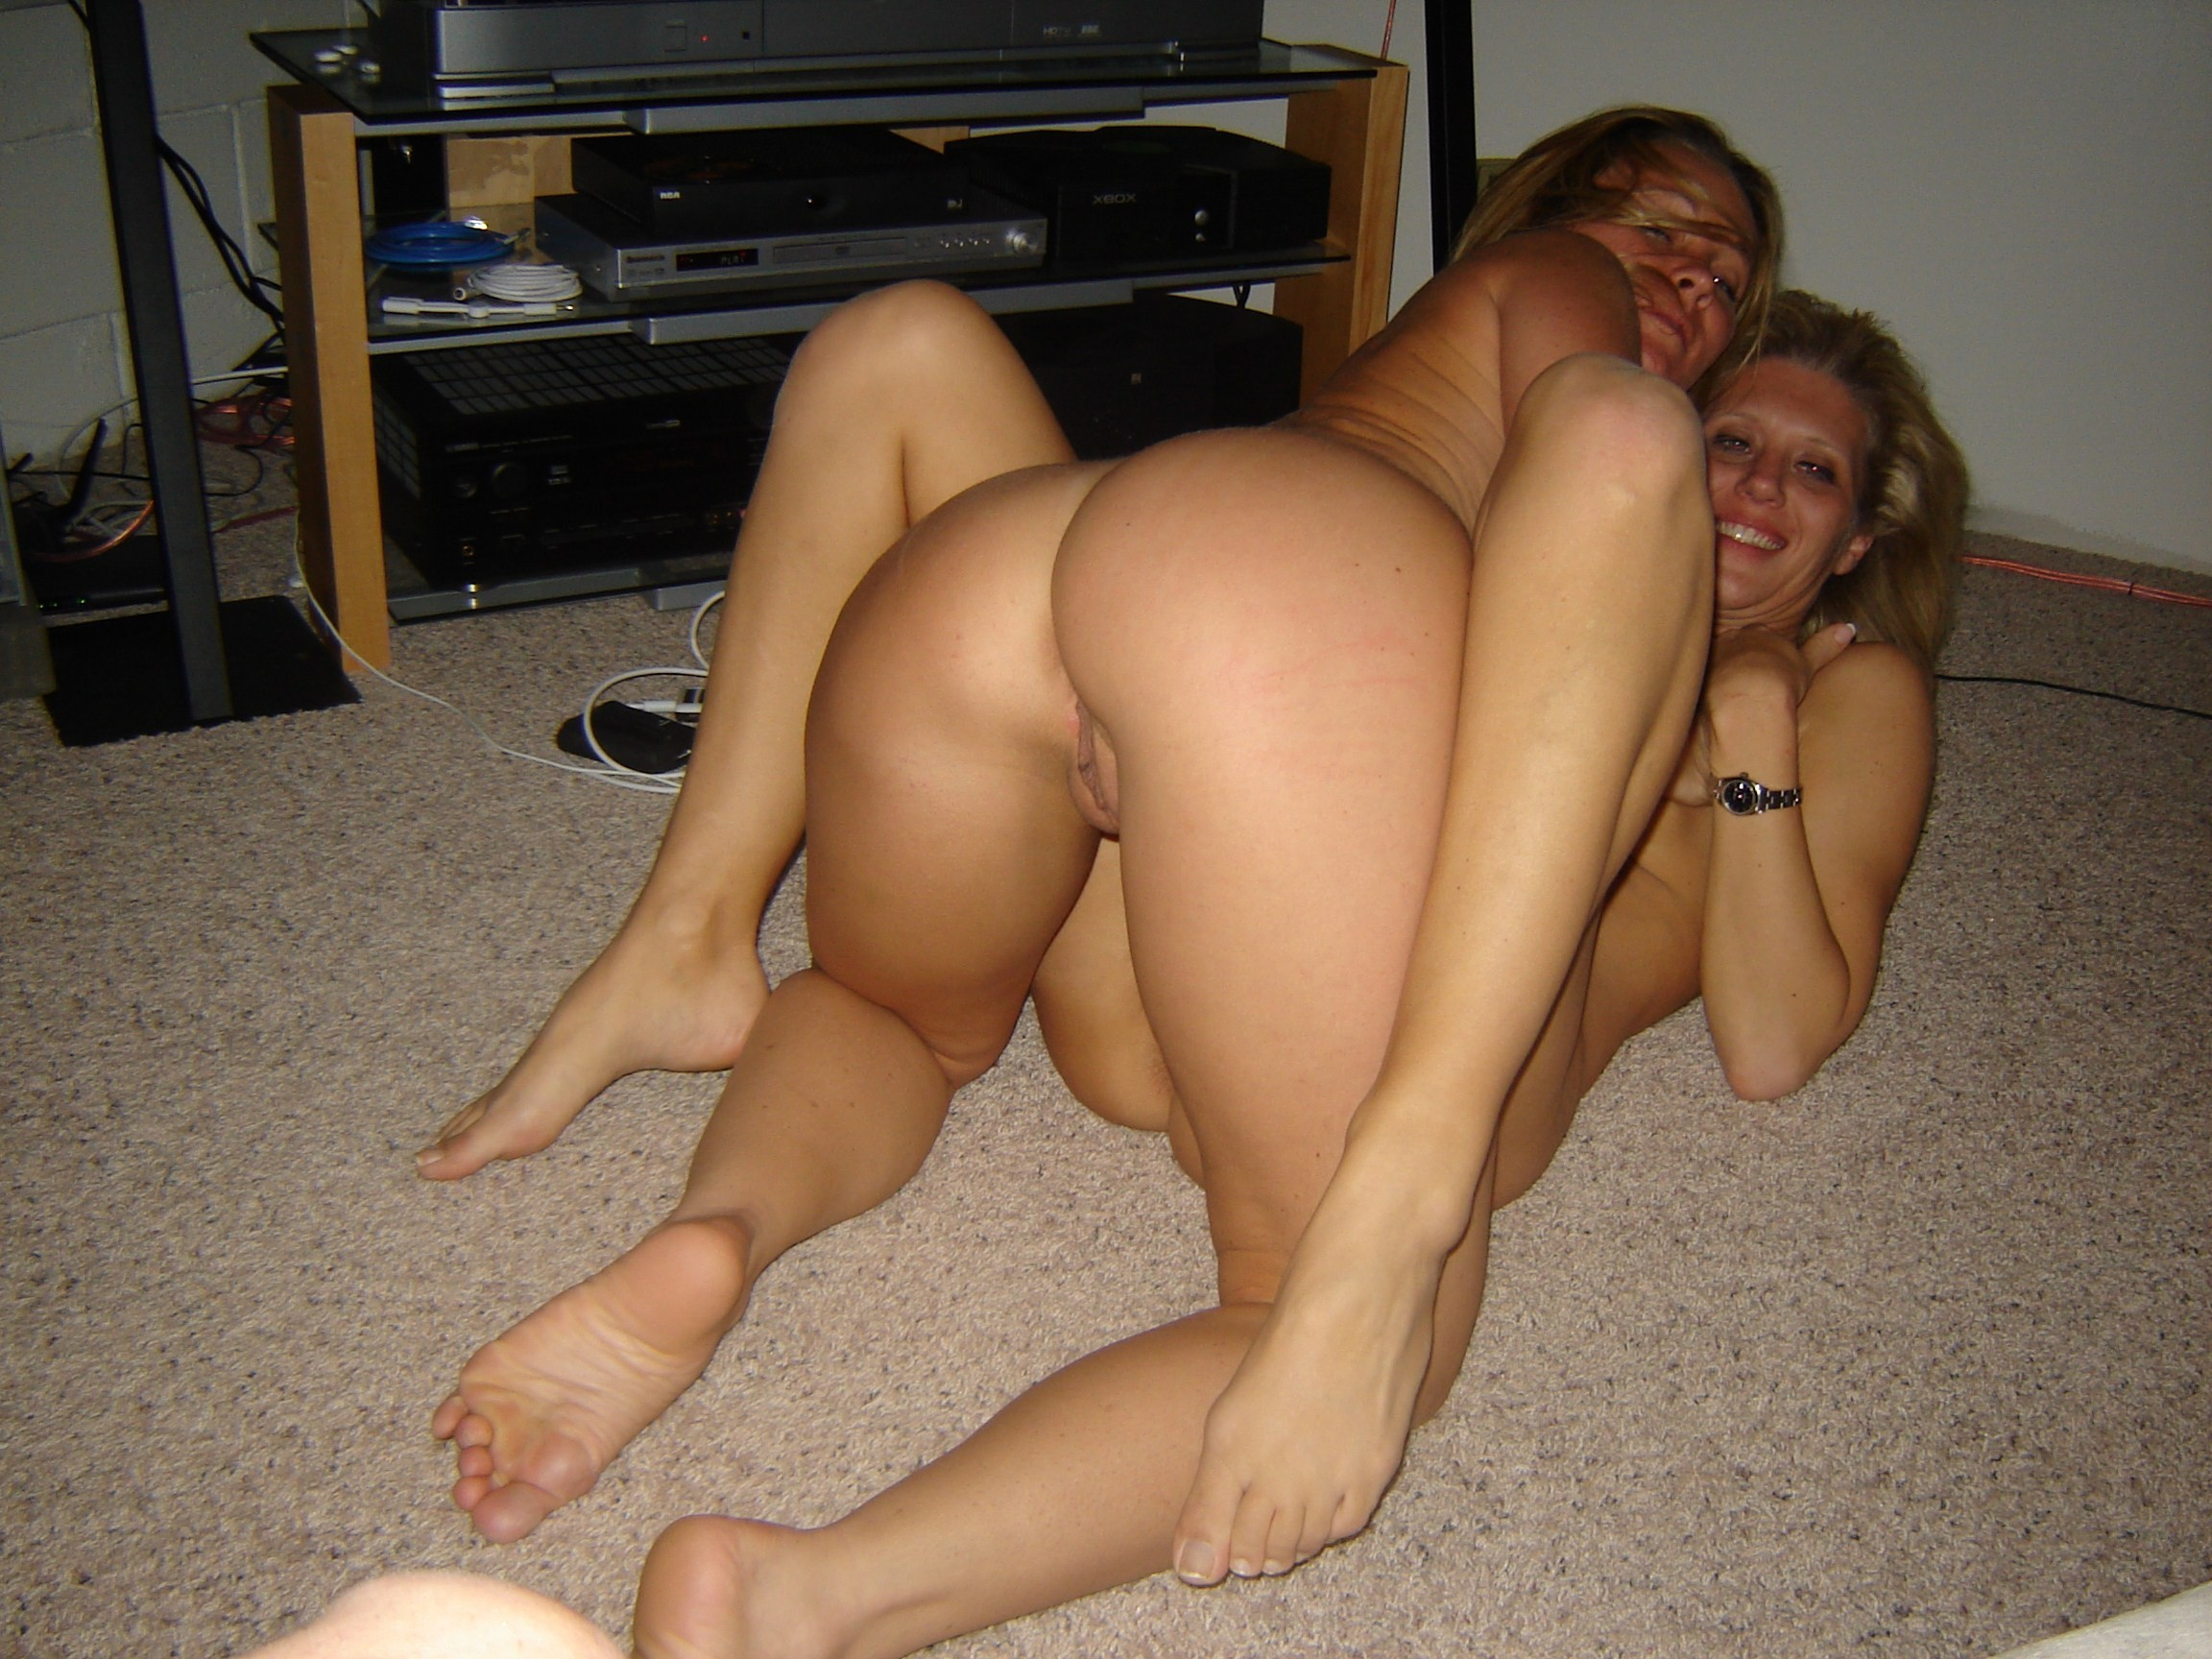 Тёлки виде порно 1 фотография